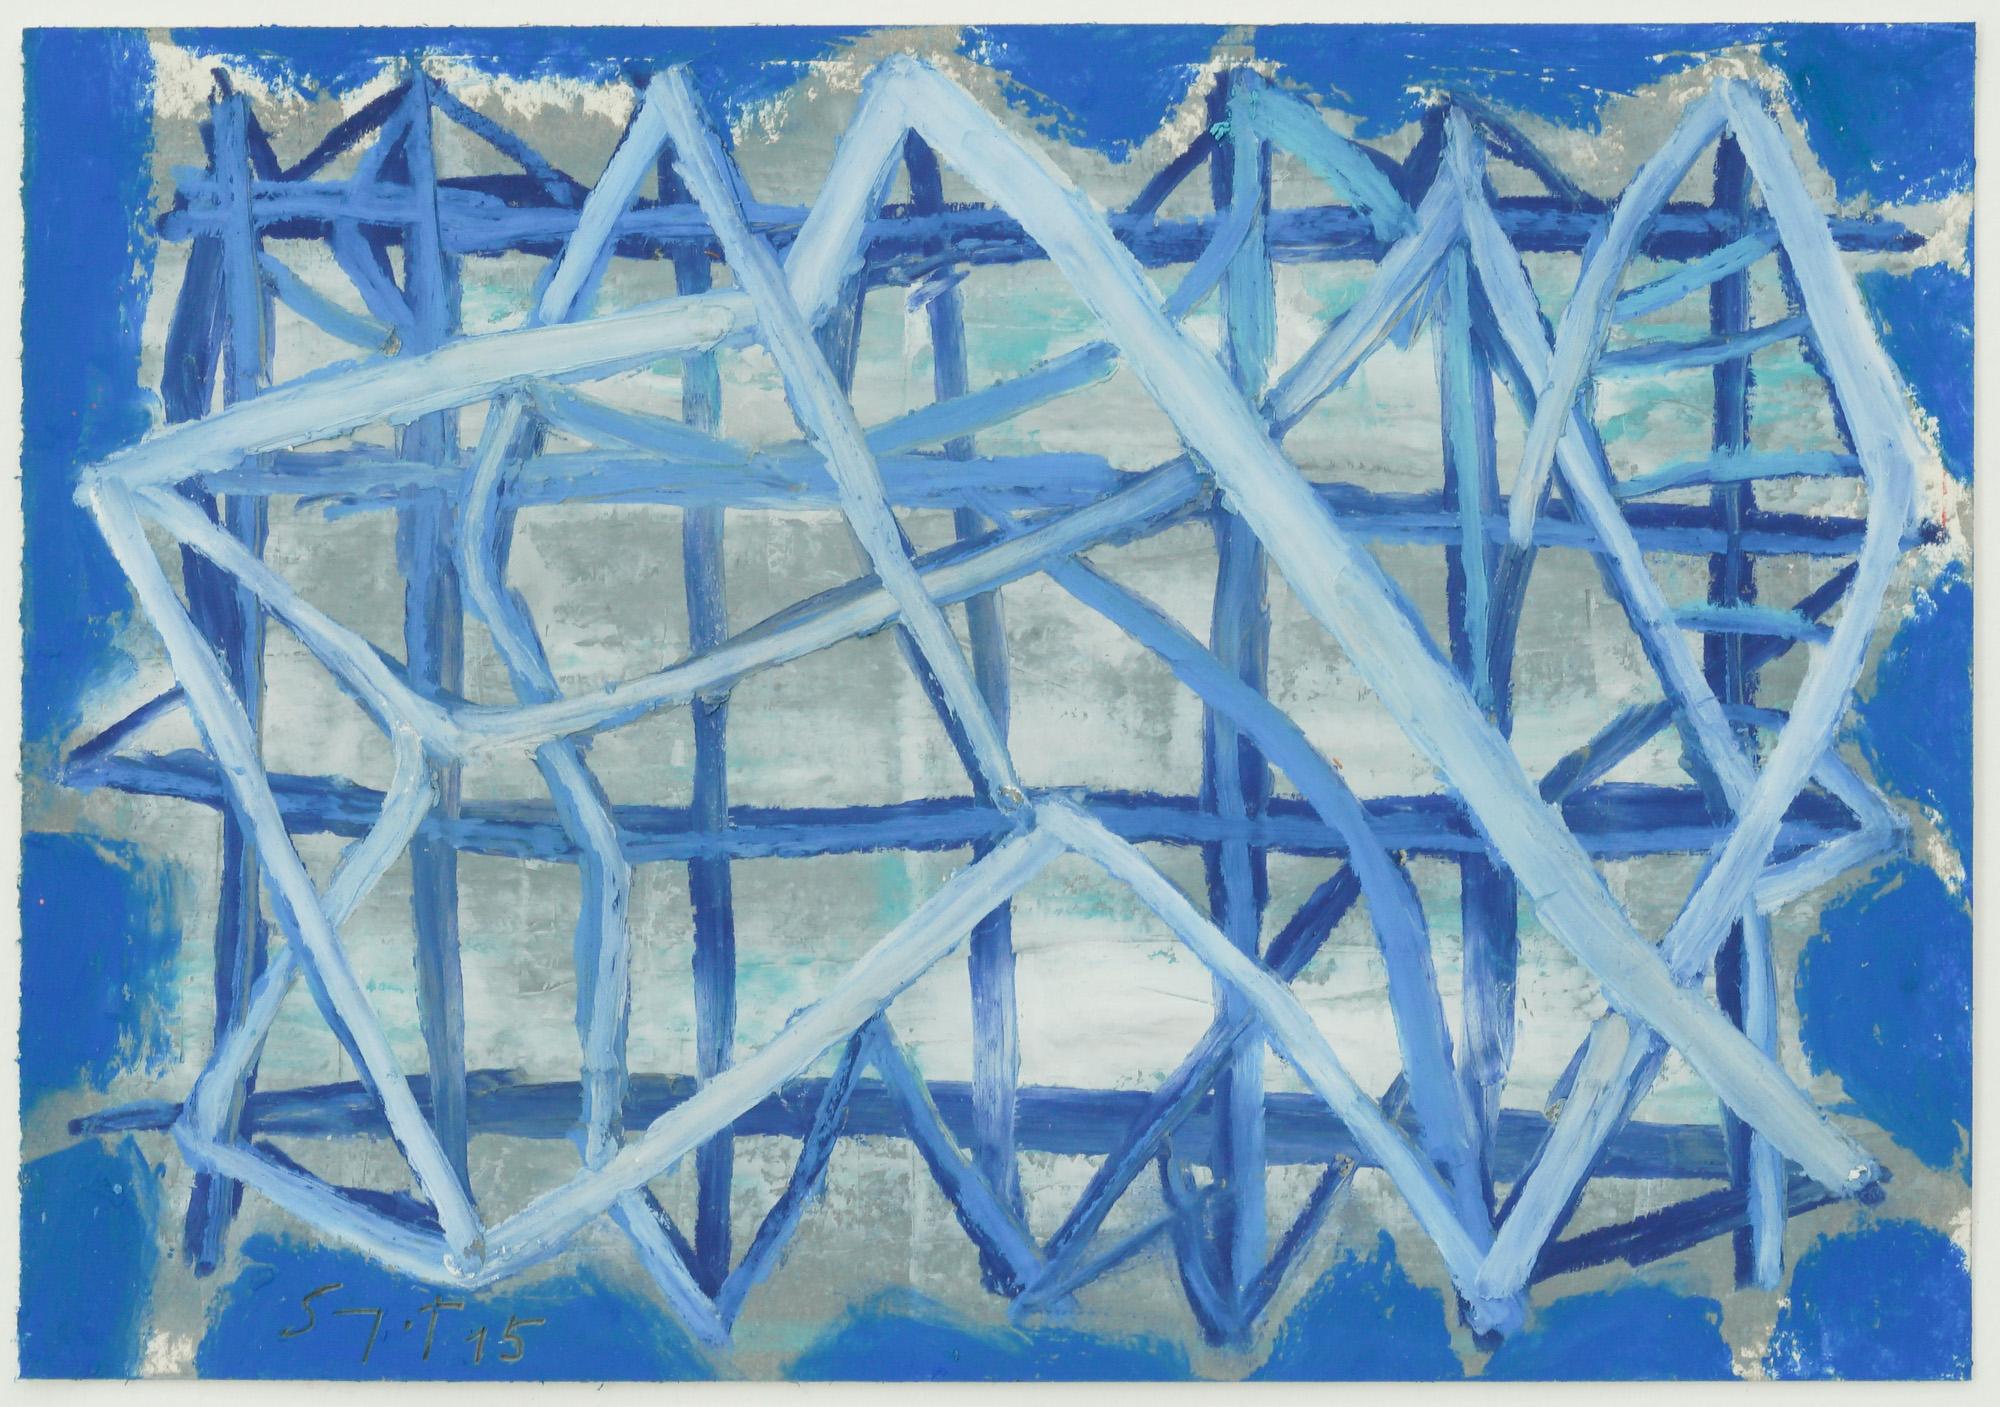 Somyot Hananuntasuk, 2015_23, 2015, Oil Pastel on Paper, 18 x 26 cm, Affinity Art.jpg